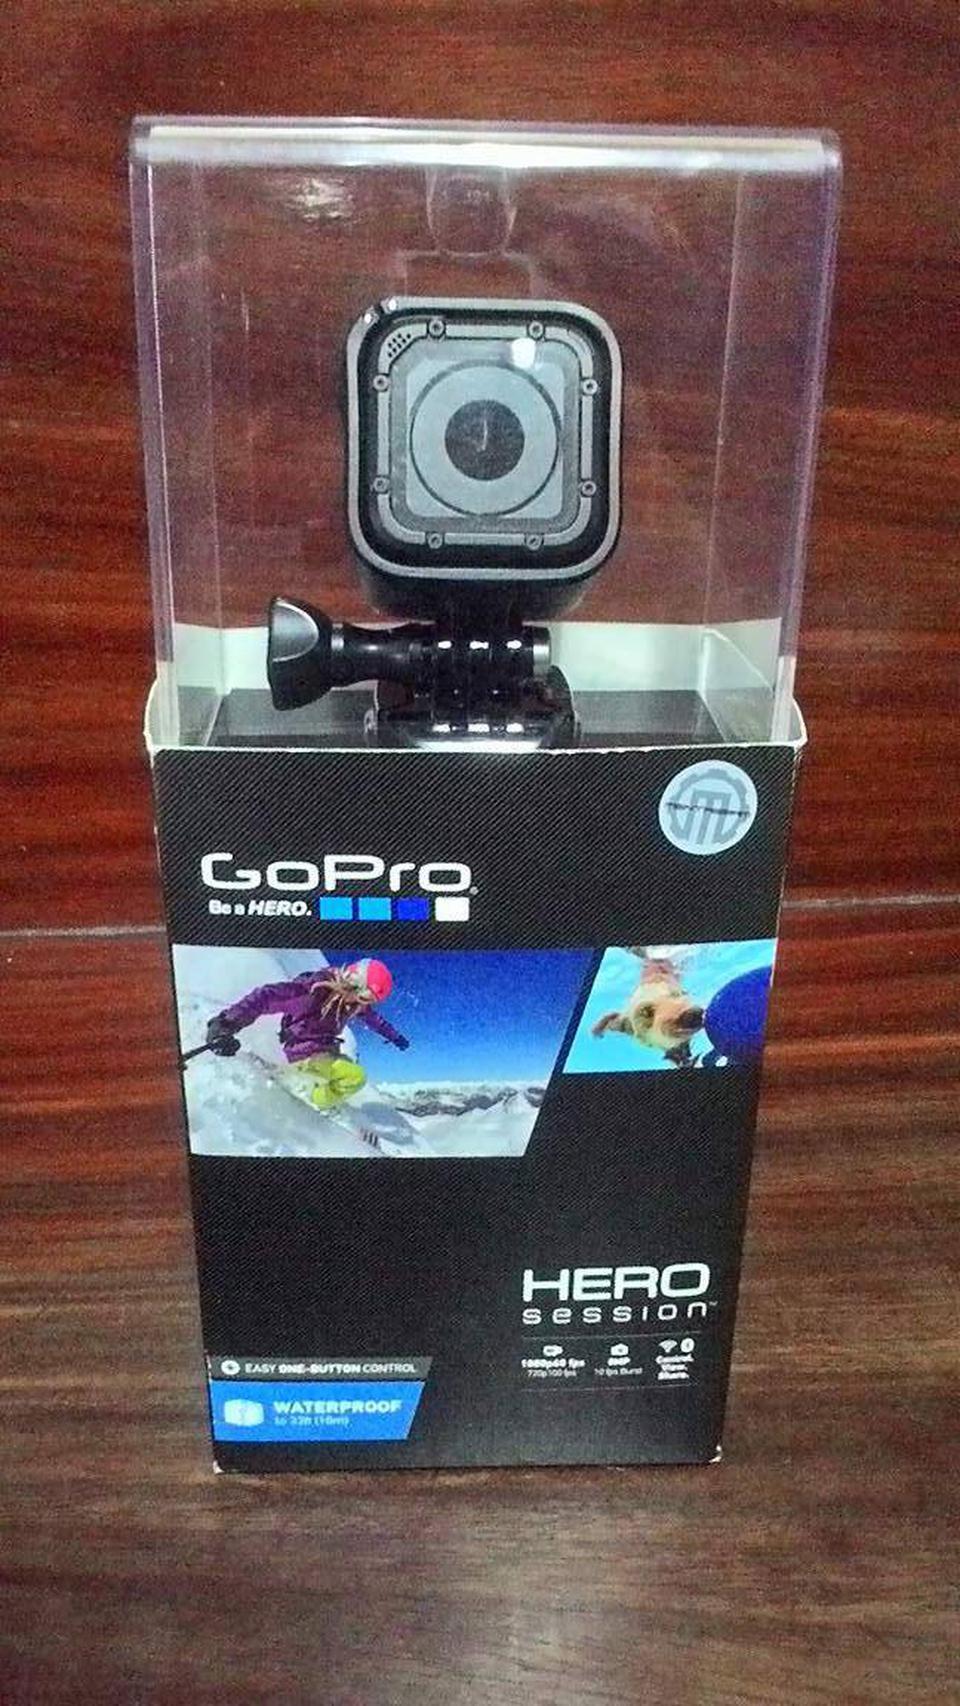 Gopro Hero Session ประกัน Big Camera 6 เดือน รูปที่ 1